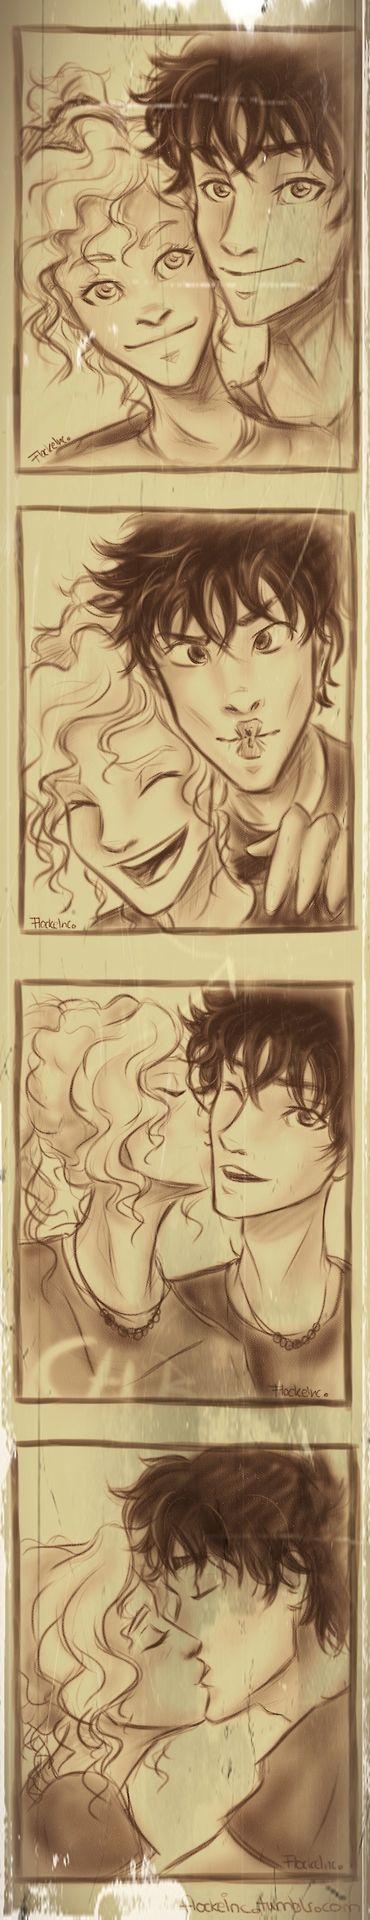 Annabeth Chase & Percy Jackson (Artwork)                              …